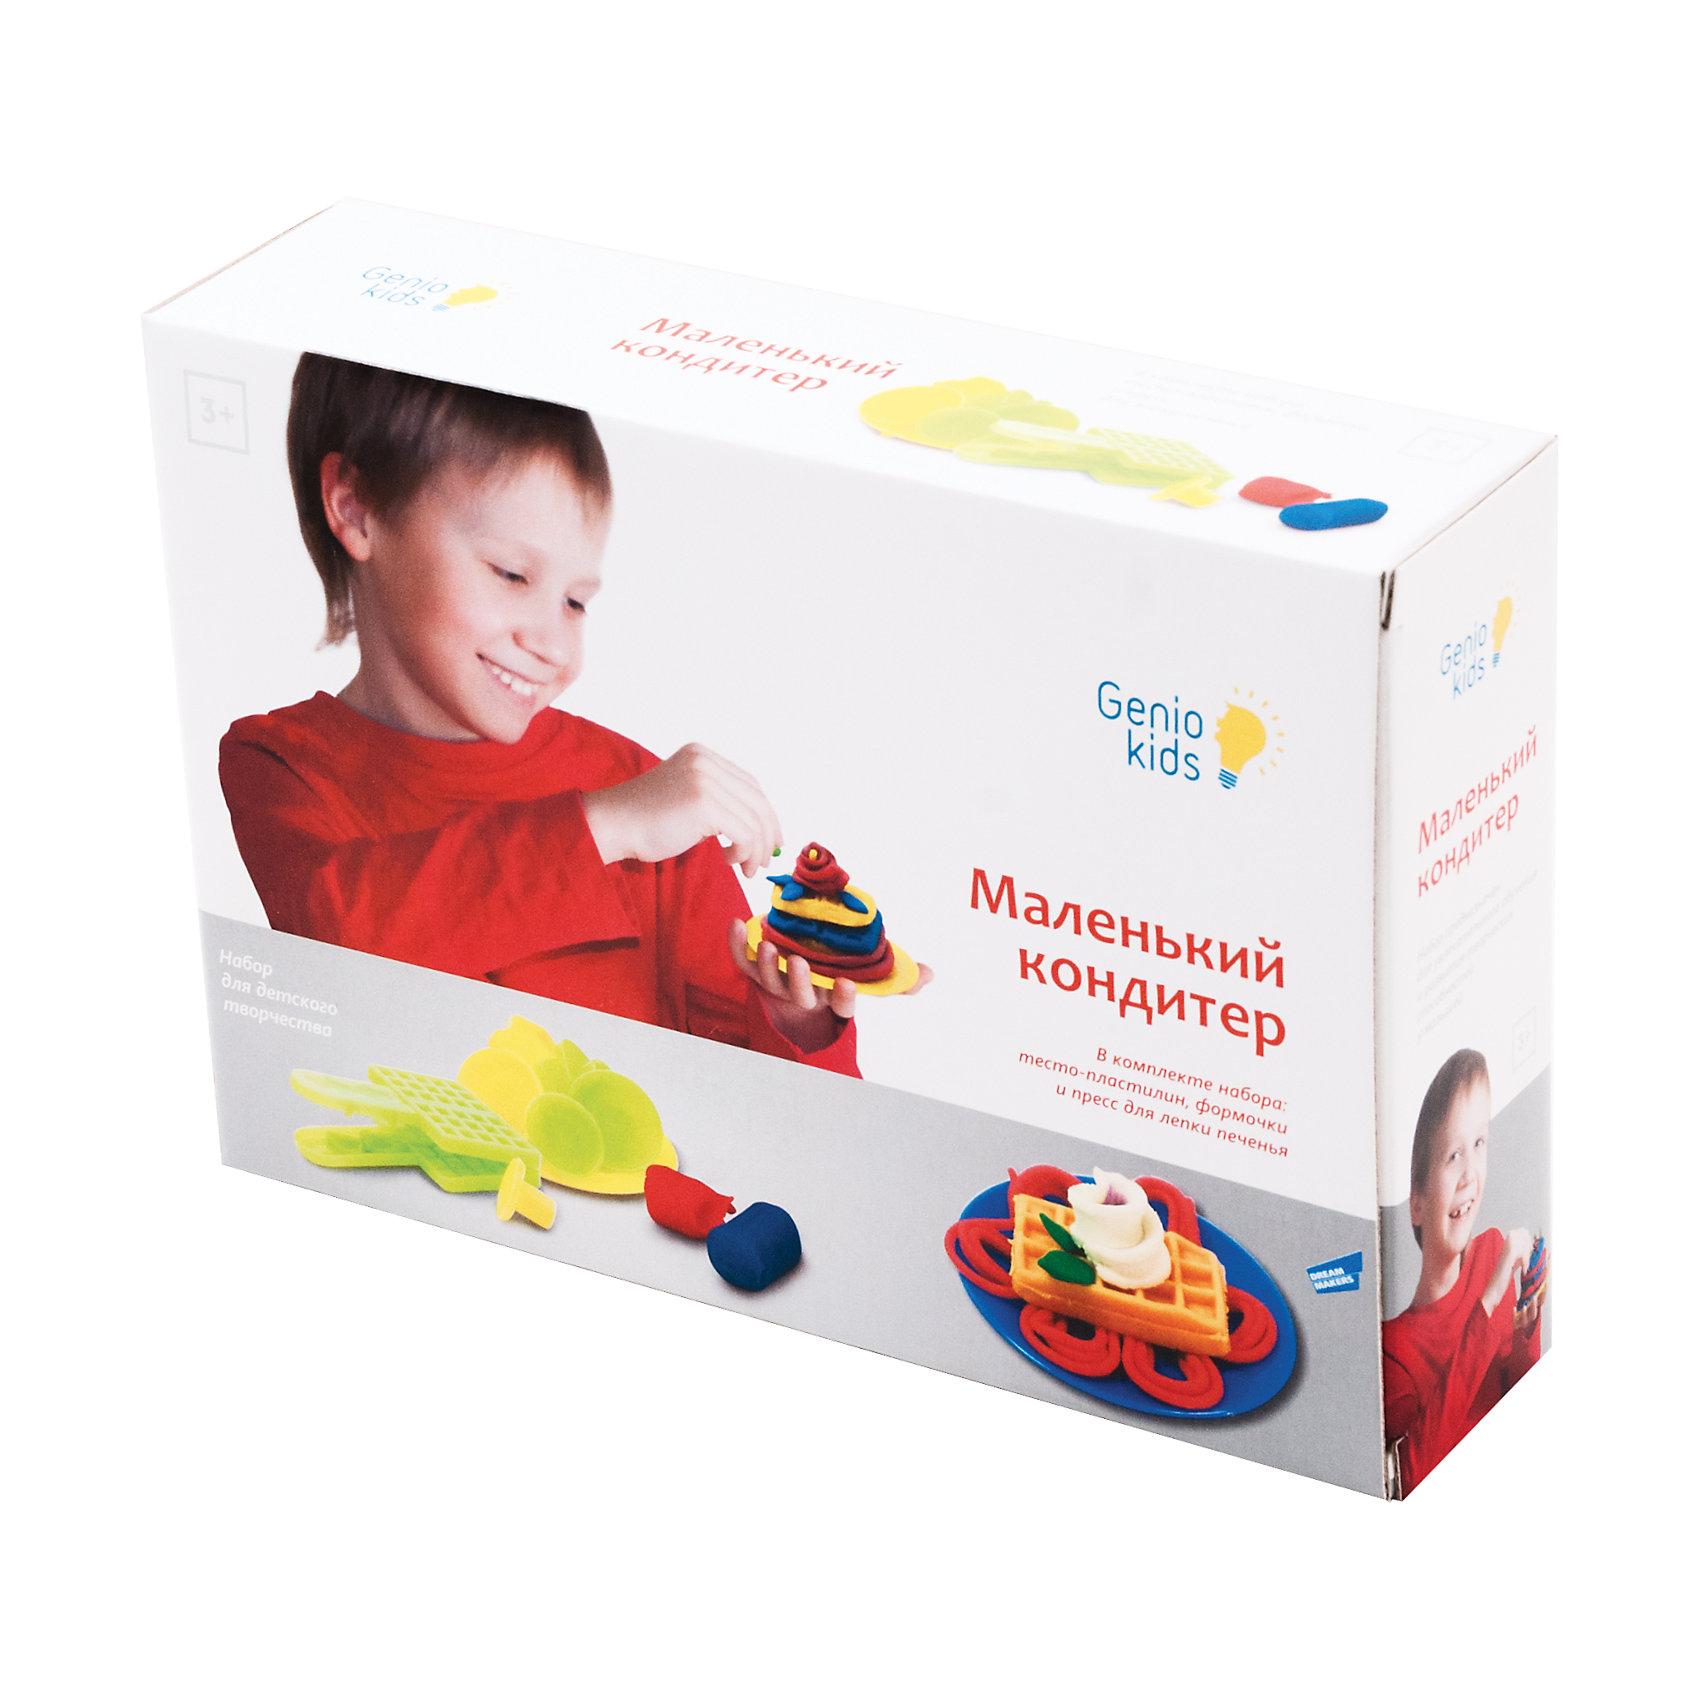 "Genio Kids Набор для детской лепки Маленький кондитер genio kids набор для детского творчества ""шкатулка"""